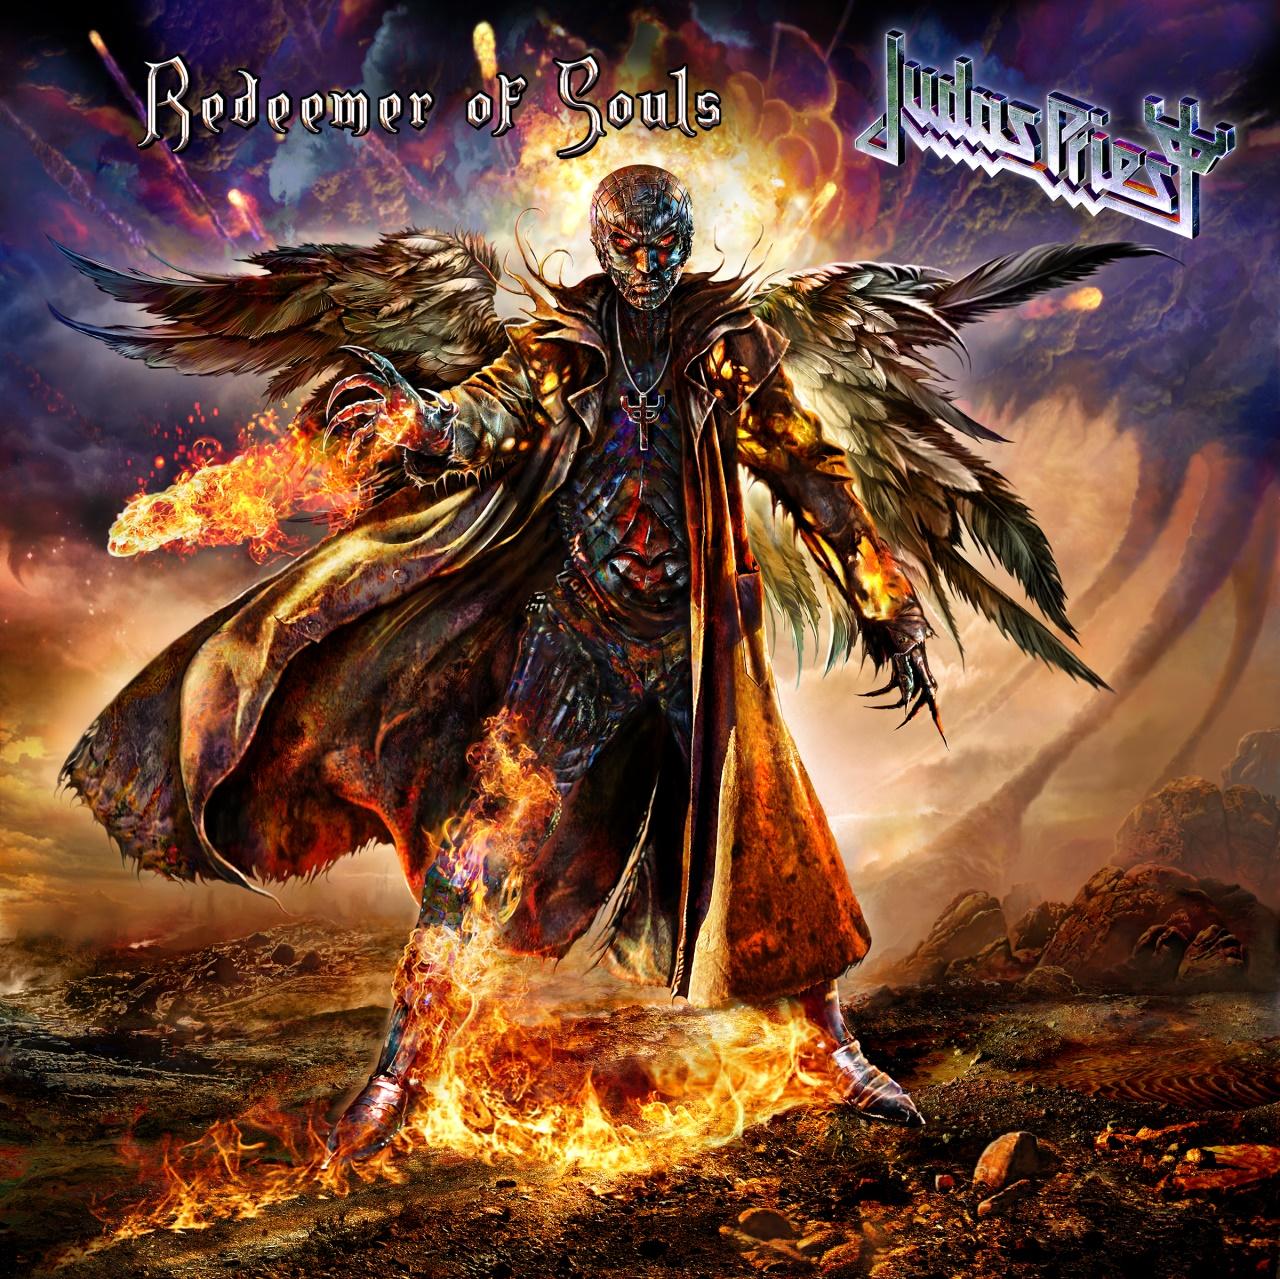 """Redeemer of Souls"" είναι ο τίτλος του νέου άλμπουμ των Judas Priest Redeemer-of-souls-album-cover-art-1280"